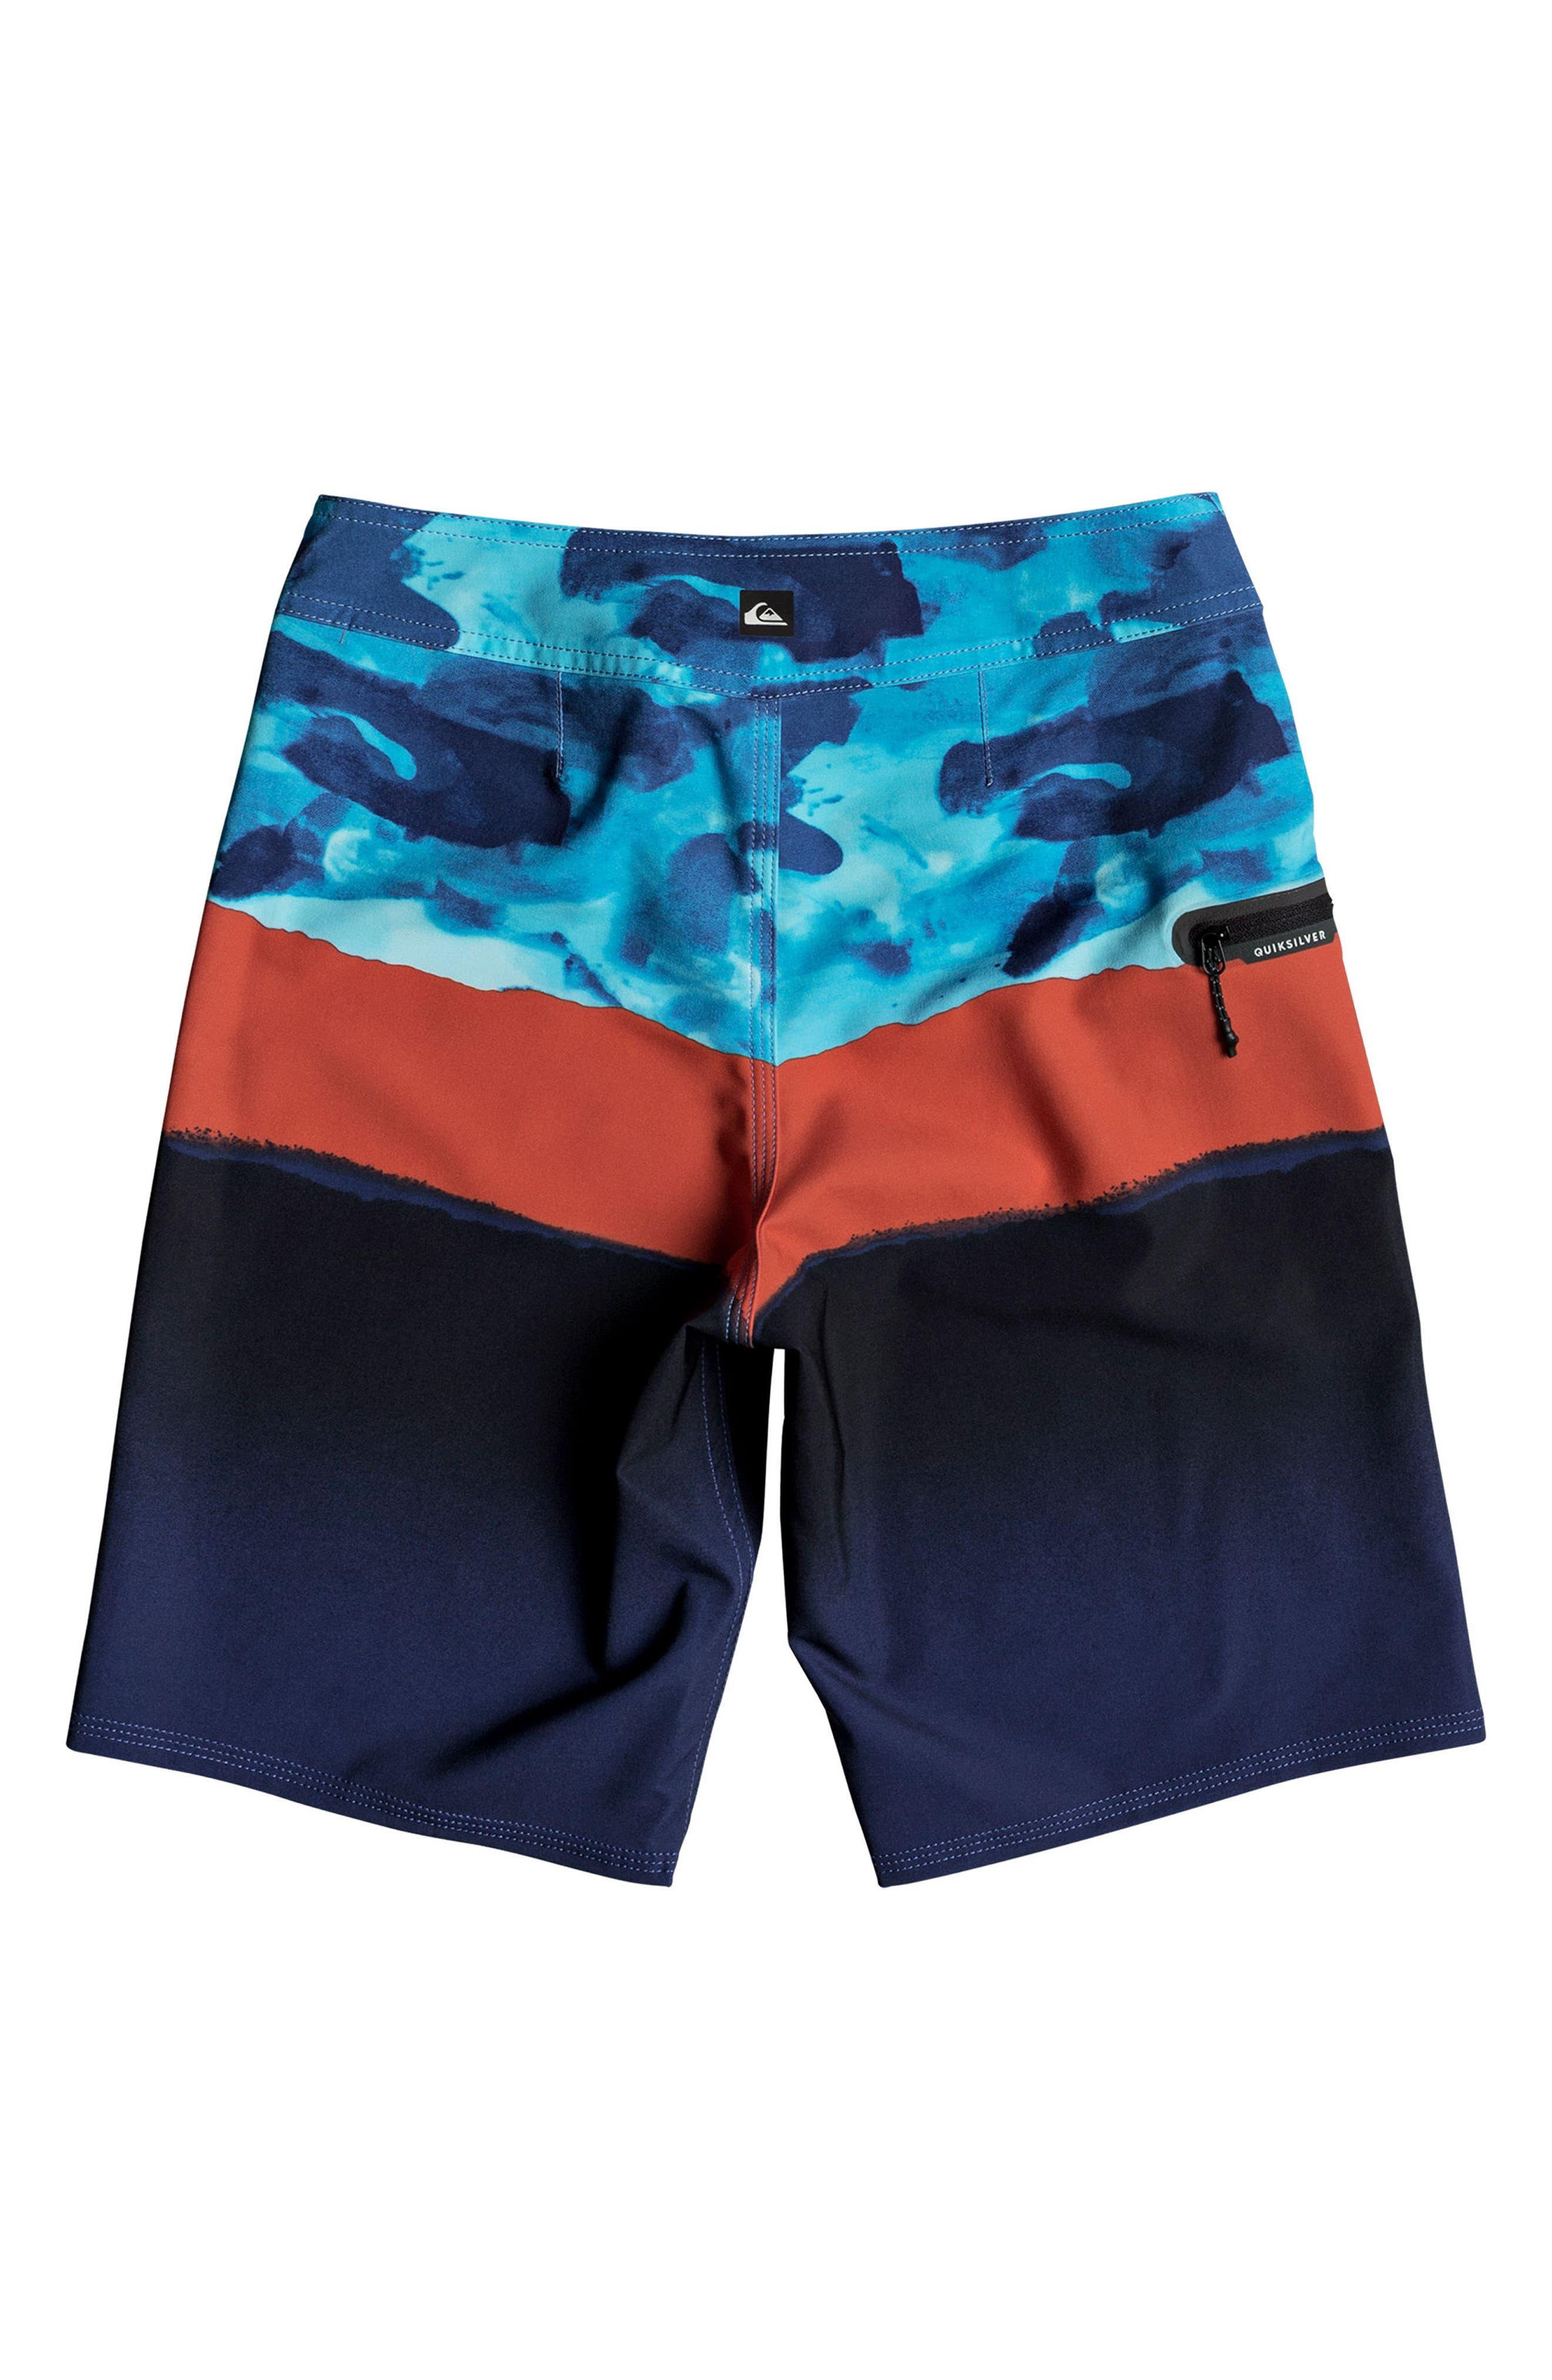 Alternate Image 2  - Quiksilver Blocked Resin Camo Board Shorts (Big Boys)